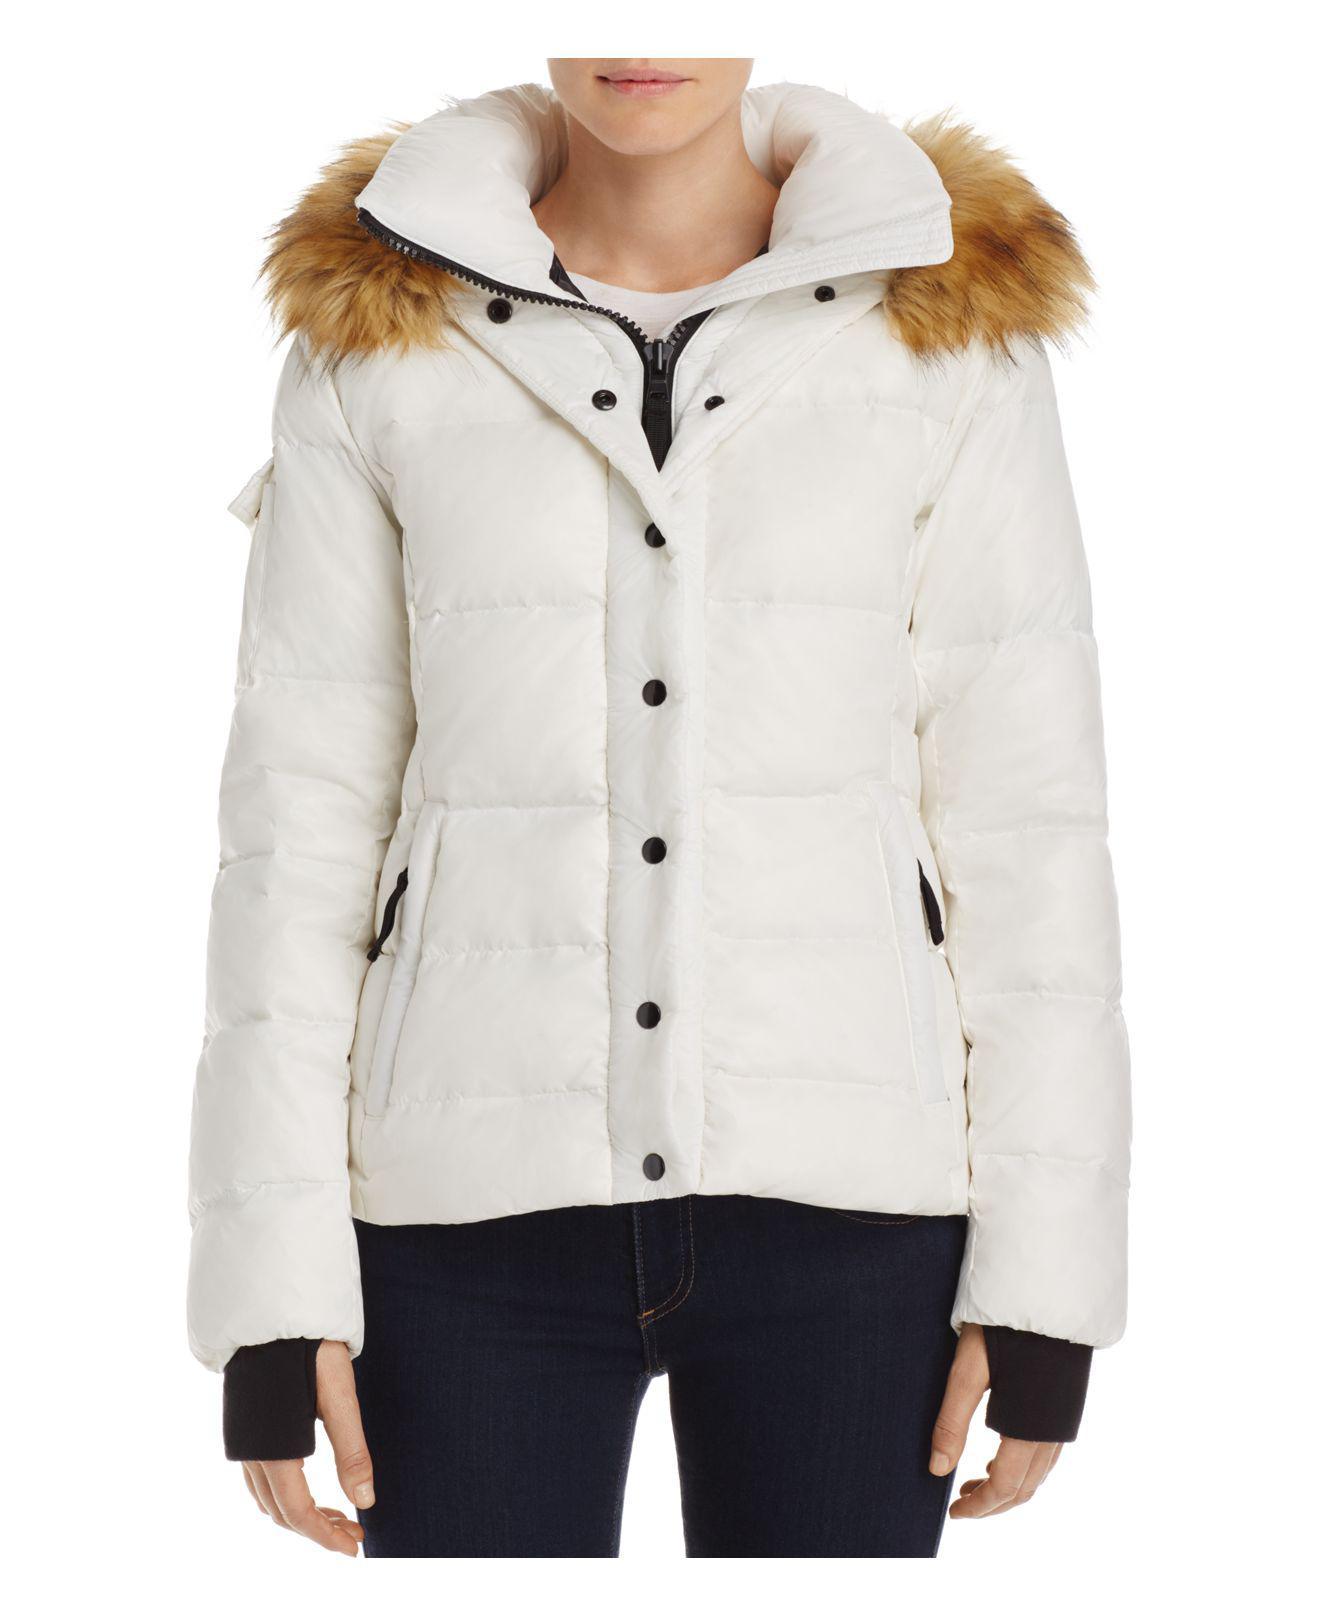 4a9df40bf9b16 Lyst - Aqua Faux Fur-trim Hooded Puffer Jacket in White